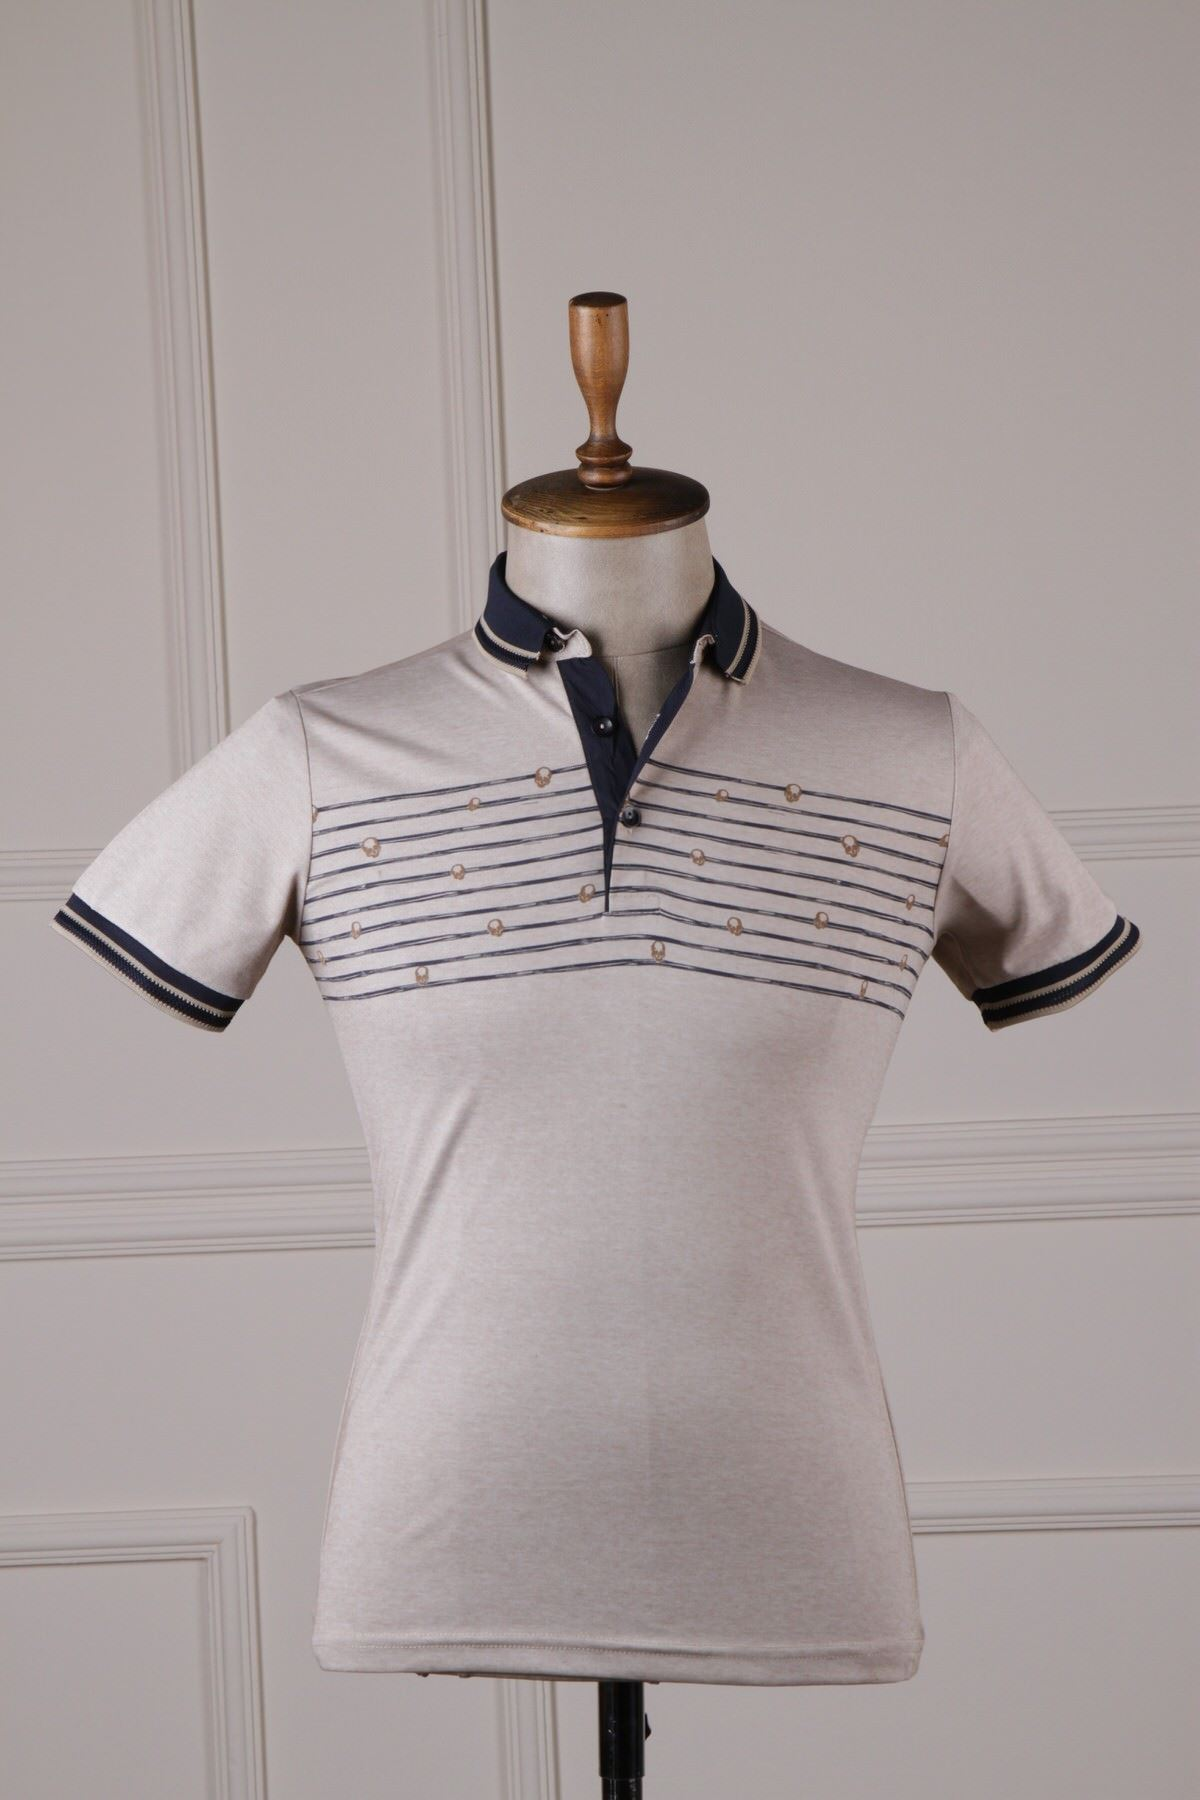 Erkek Desenli Polo Yaka T-Shirt - Bej